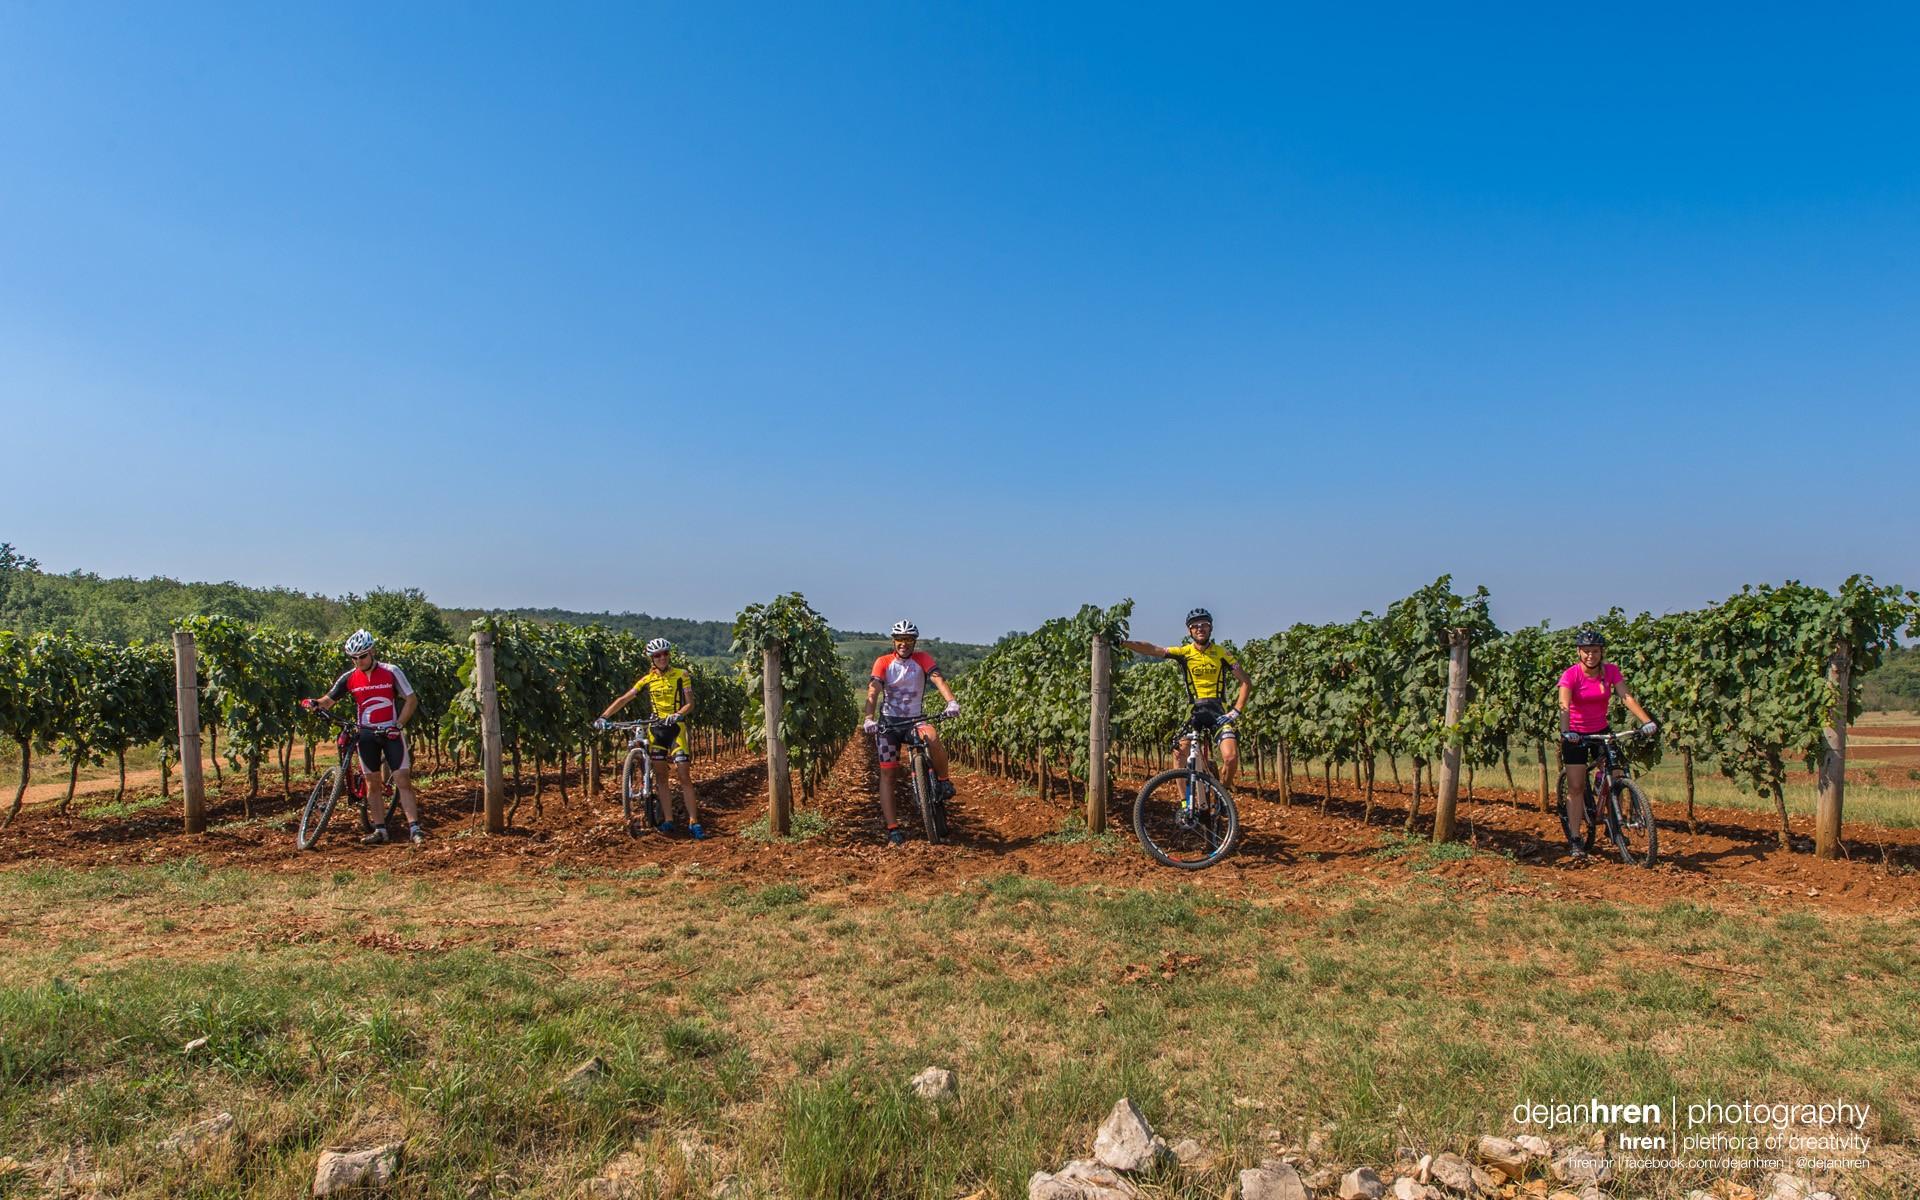 More than just a regular bike tour 1